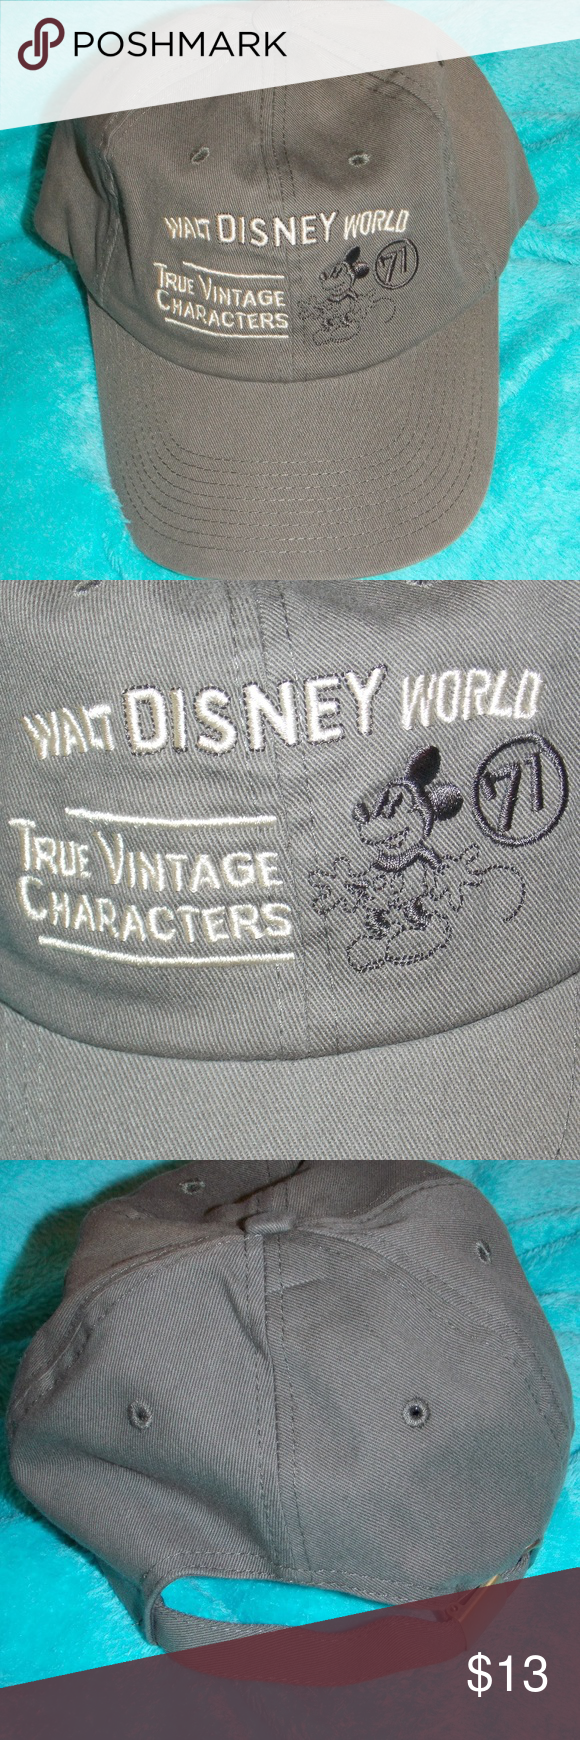 dde99e4db Walt Disney Parks True Vintage Characters Hat Cap . >>>> This item ...